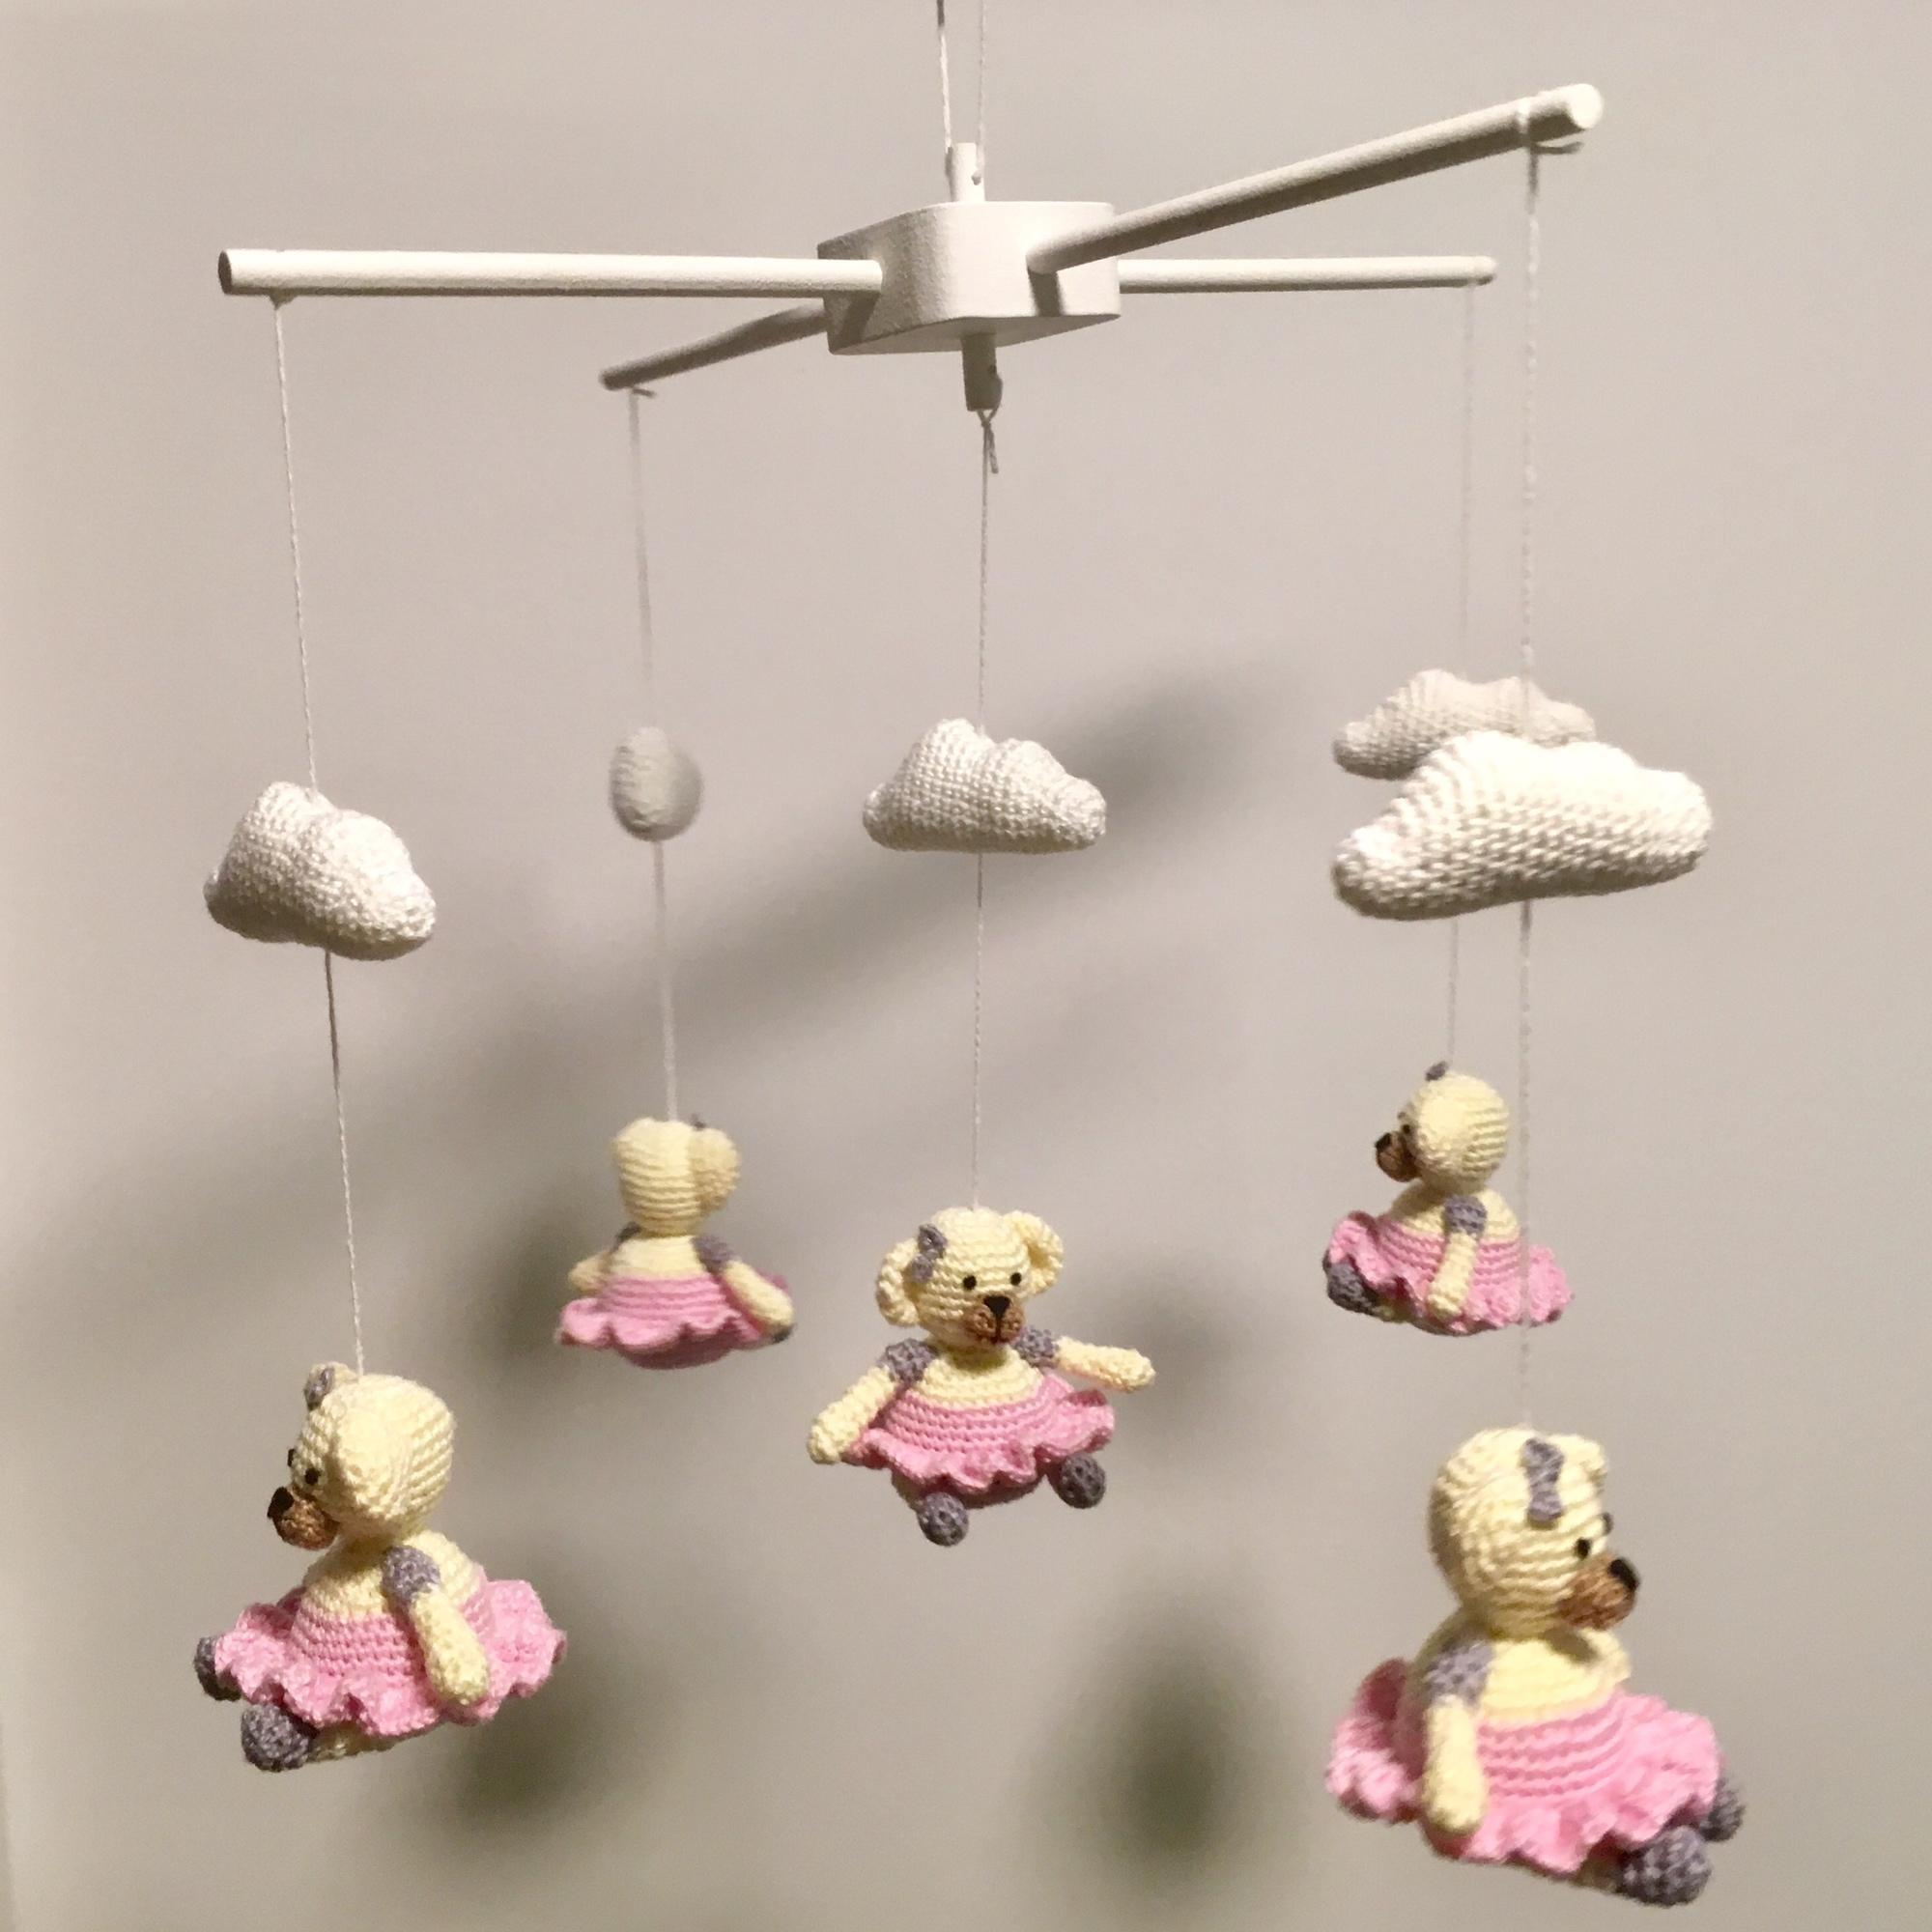 Crochet an adorable amigurumi baby mobile of a cloud with rainbow ...   2000x2000